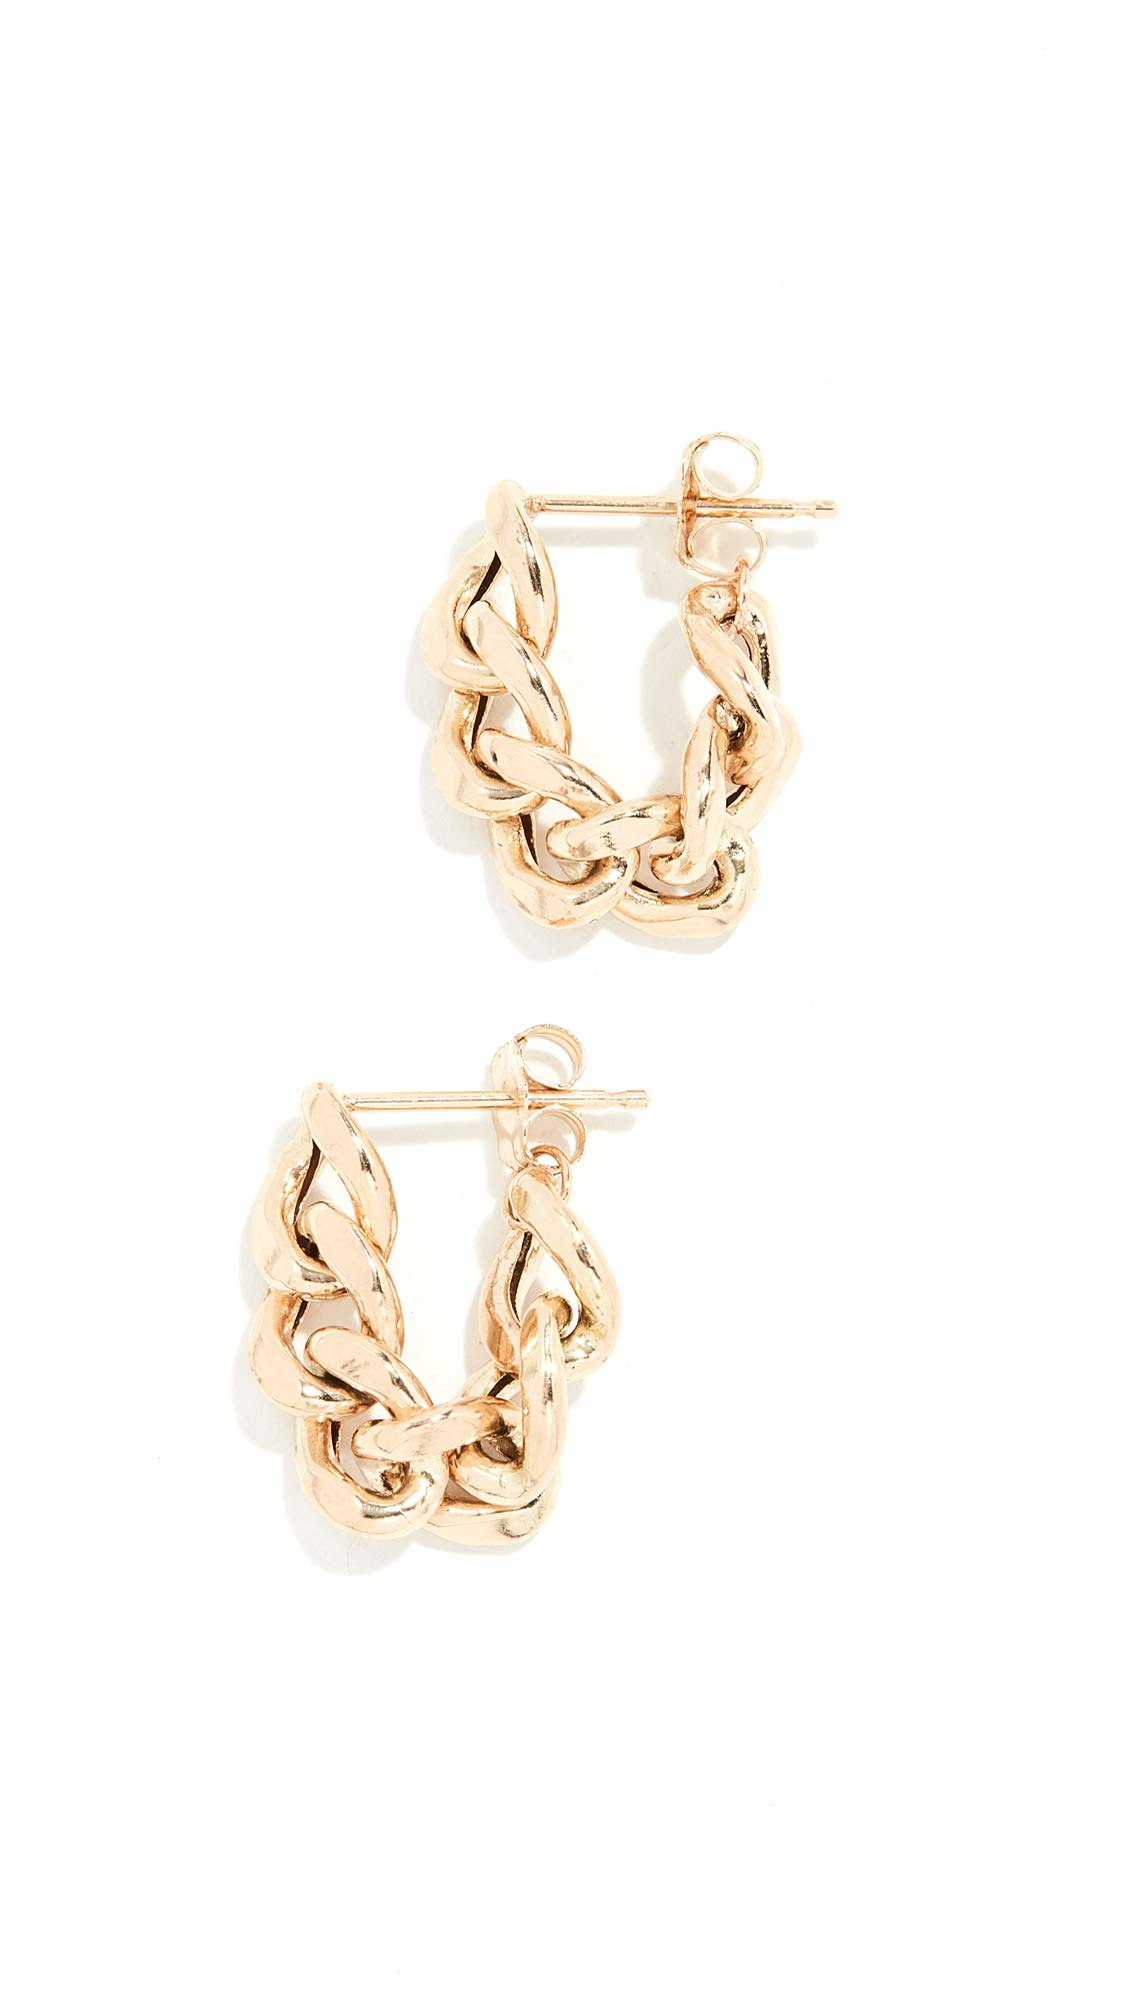 Zoe Chicco Women's 14k Gold Chain Hoop Earrings, Yellow Gold, One Size